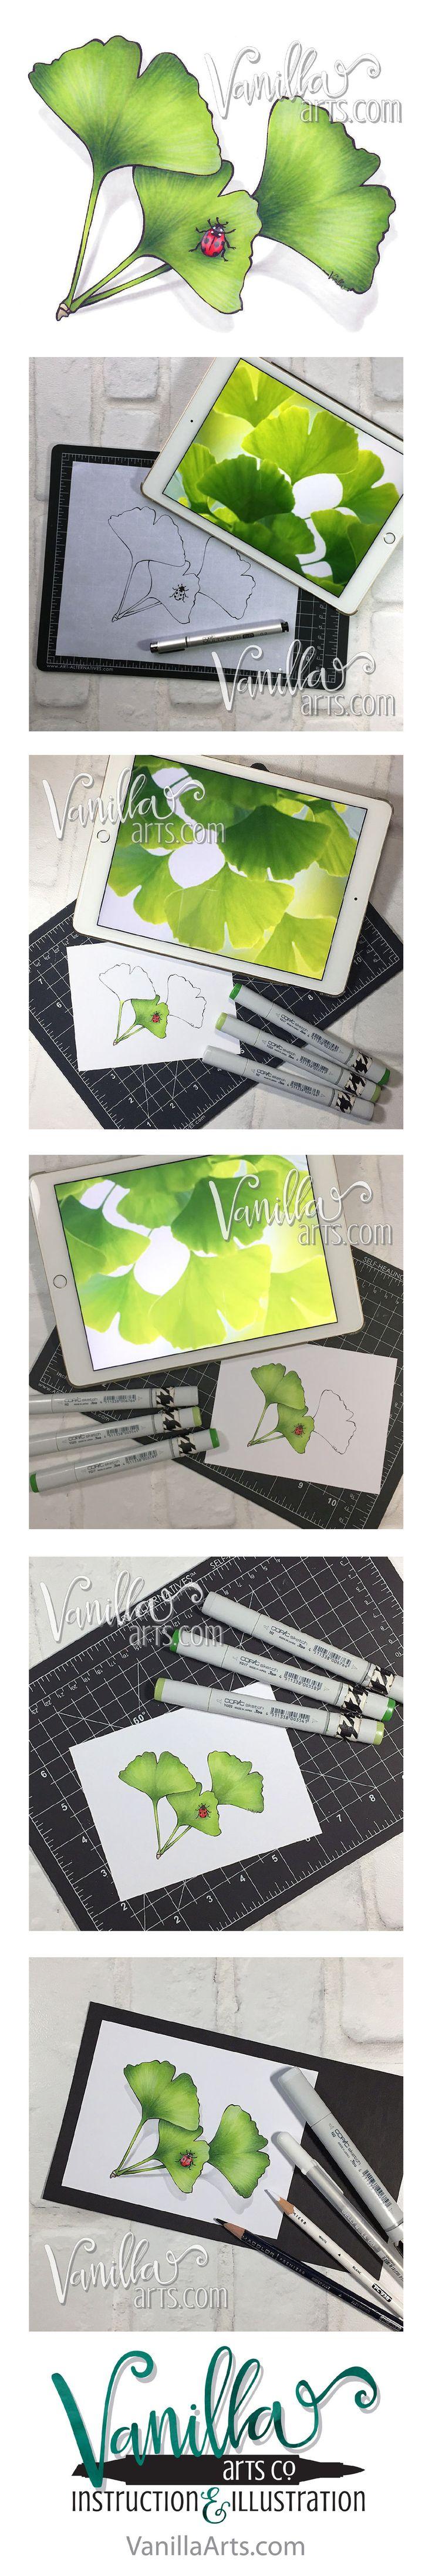 29 best Marker Painting Workshops images on Pinterest | Copic ...